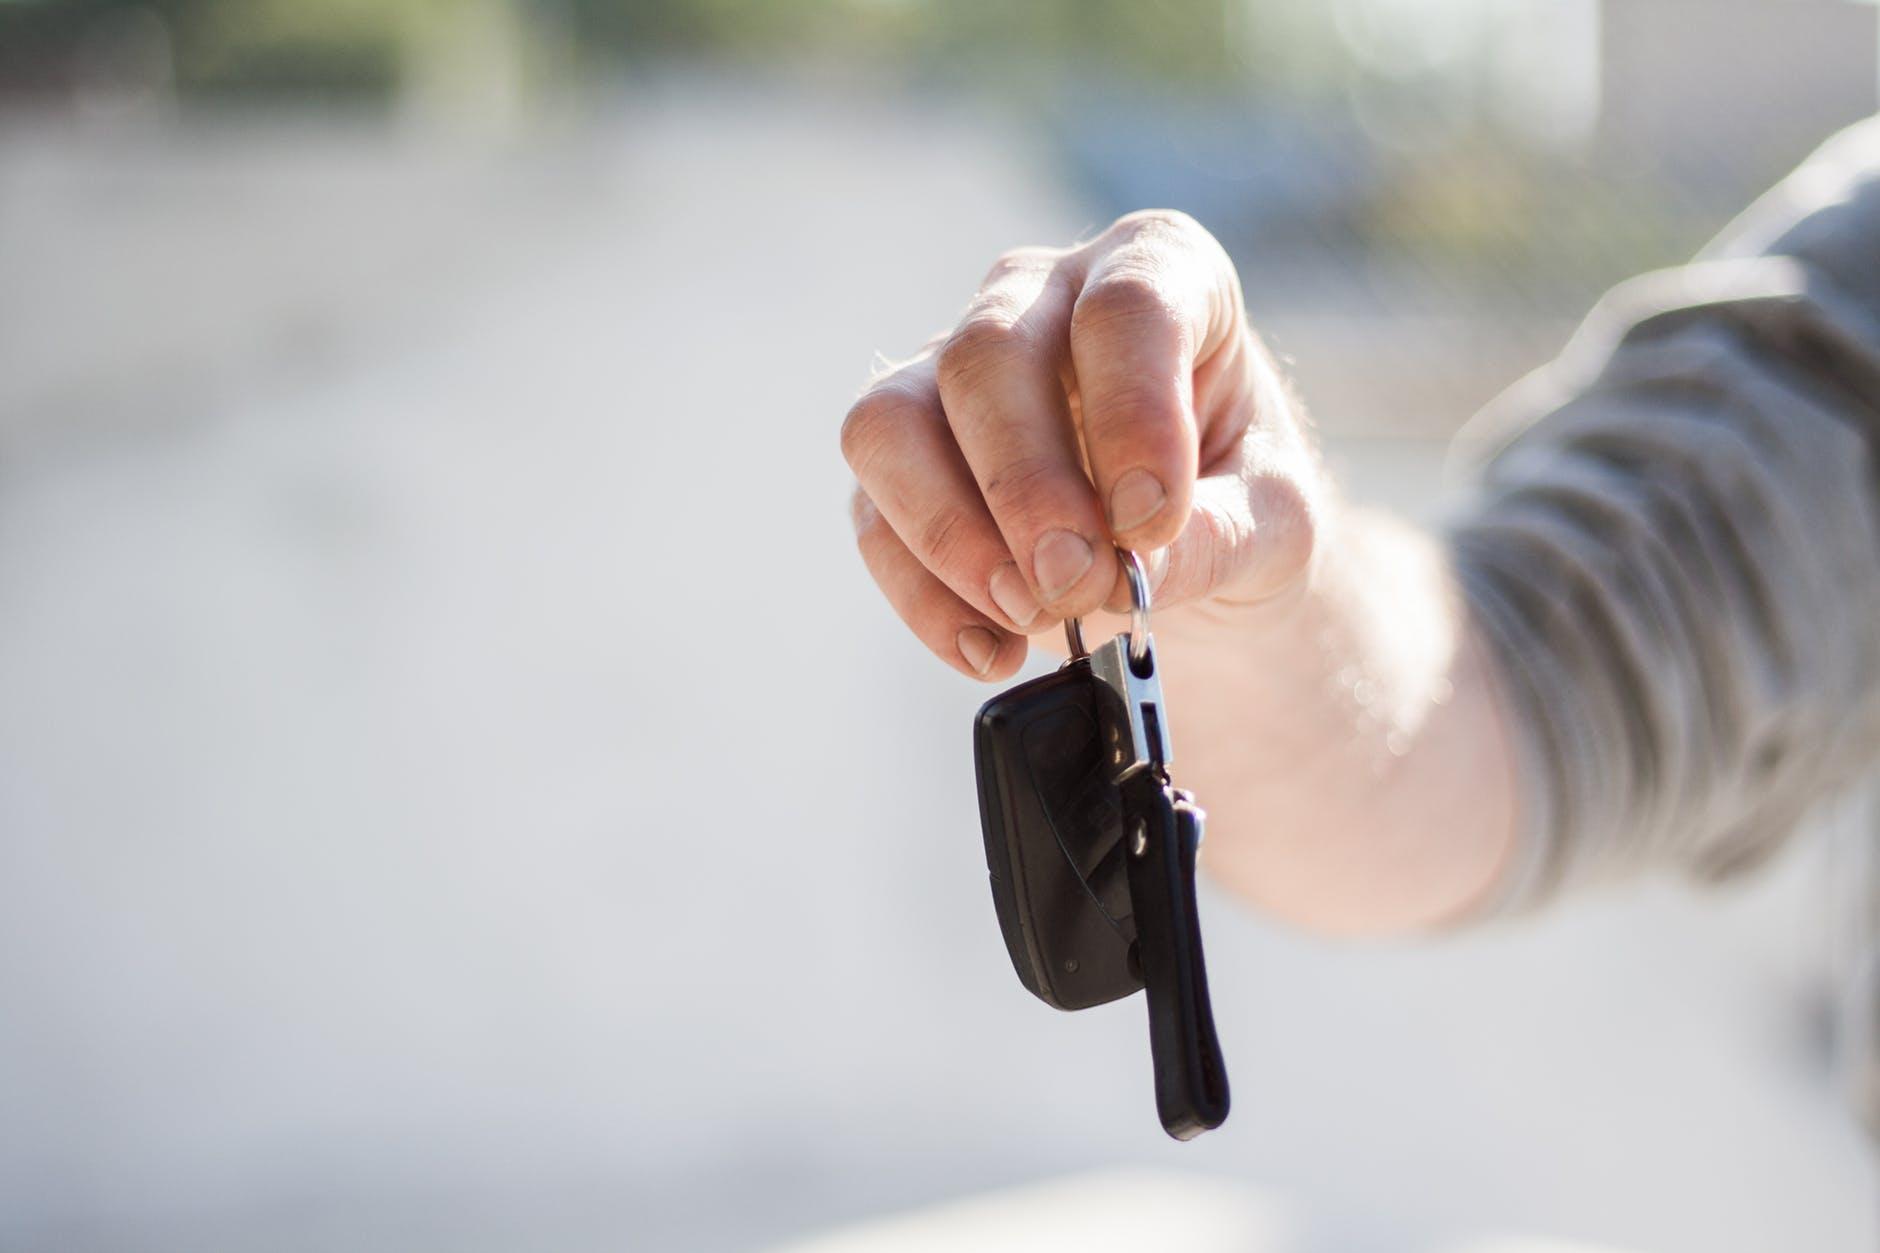 7 teens arrested in connection to stolen vehicle, burglaries